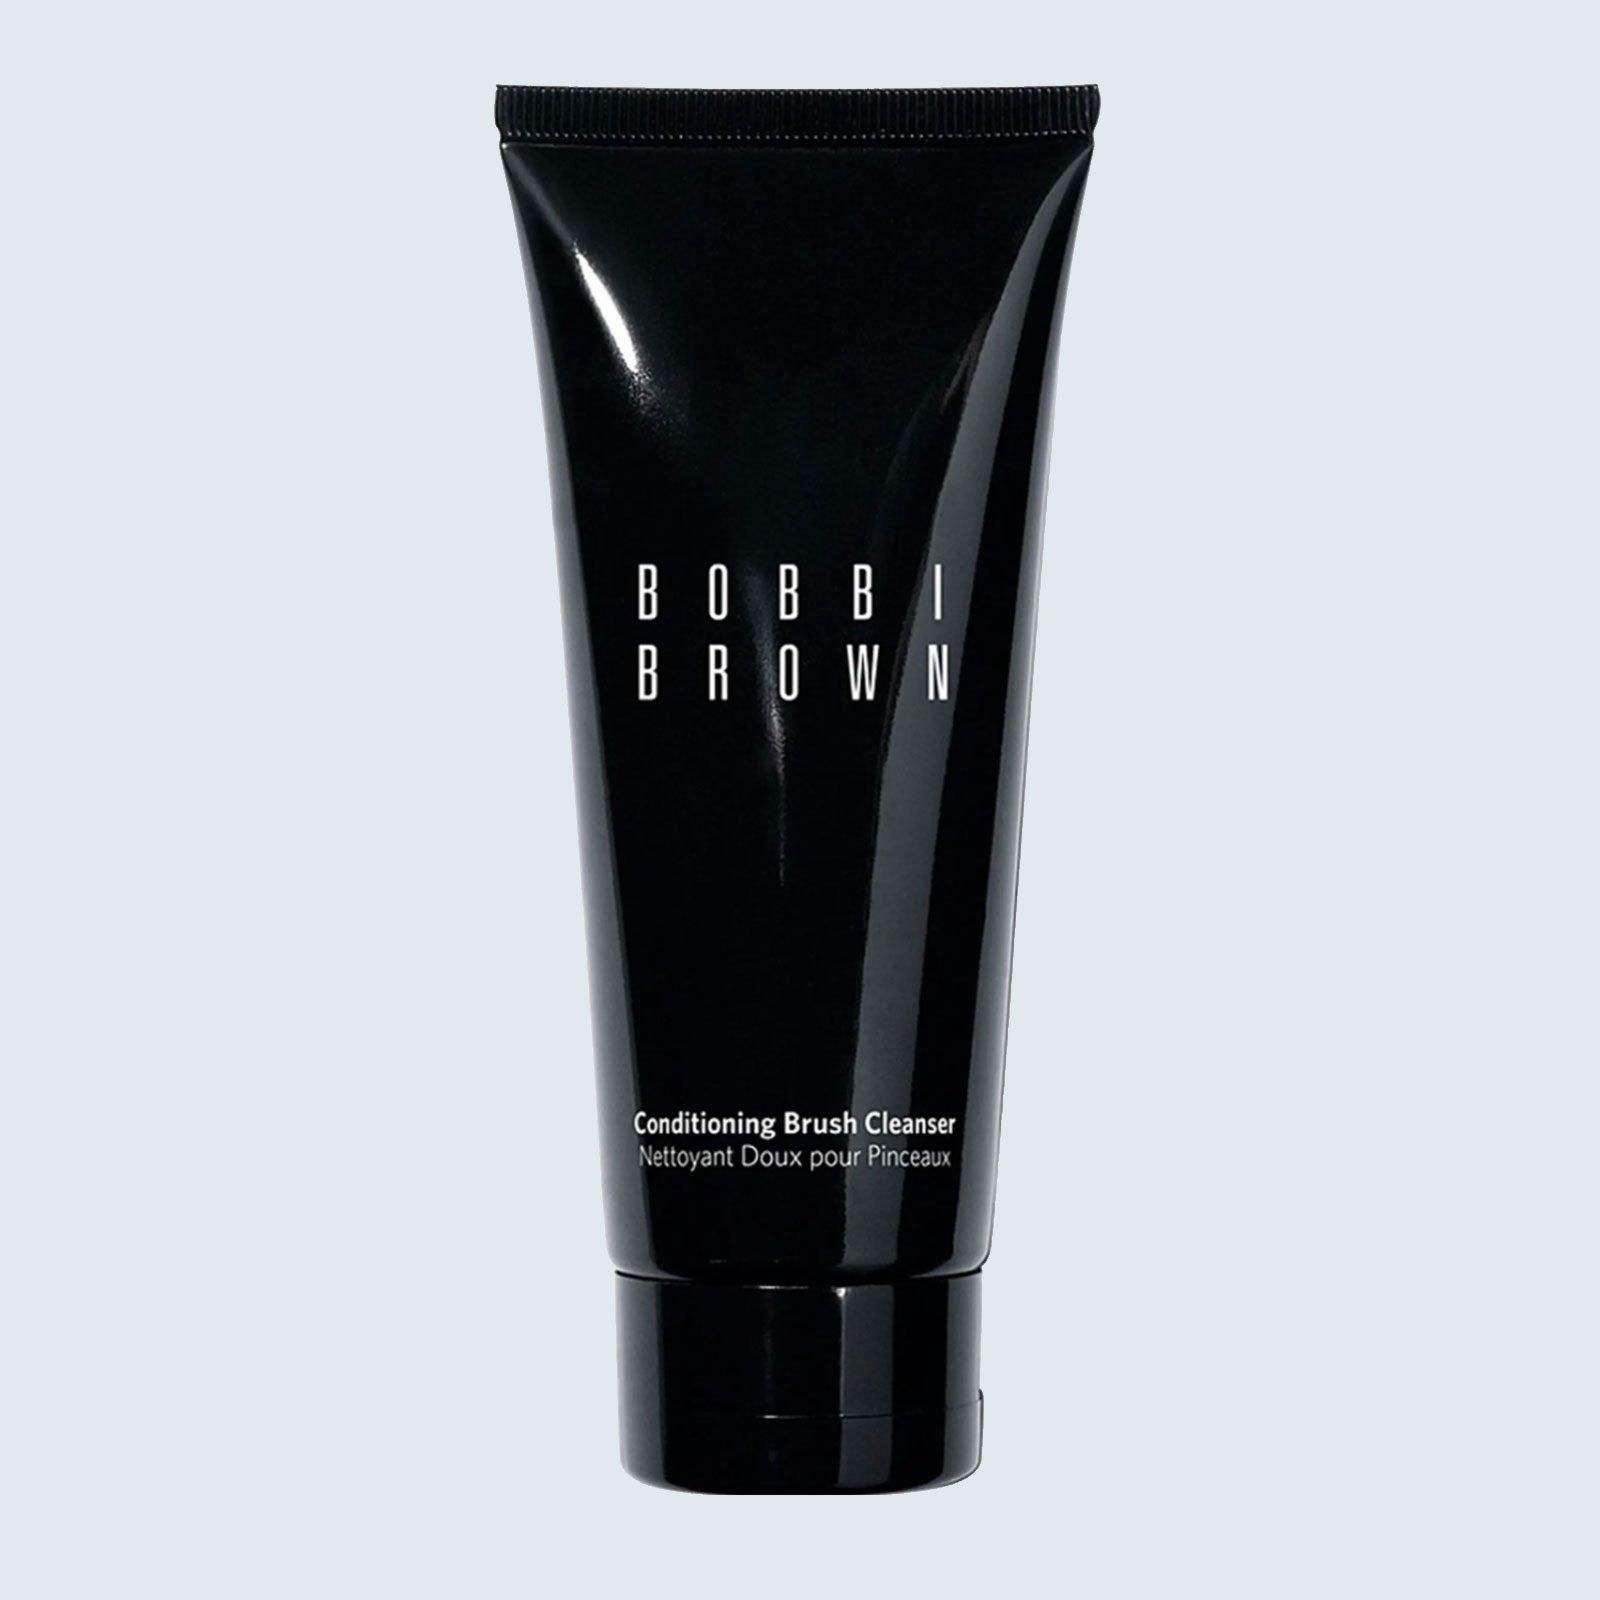 Longest-lasting makeup brush cleaner: Bobbi Brown Brush Cleanser